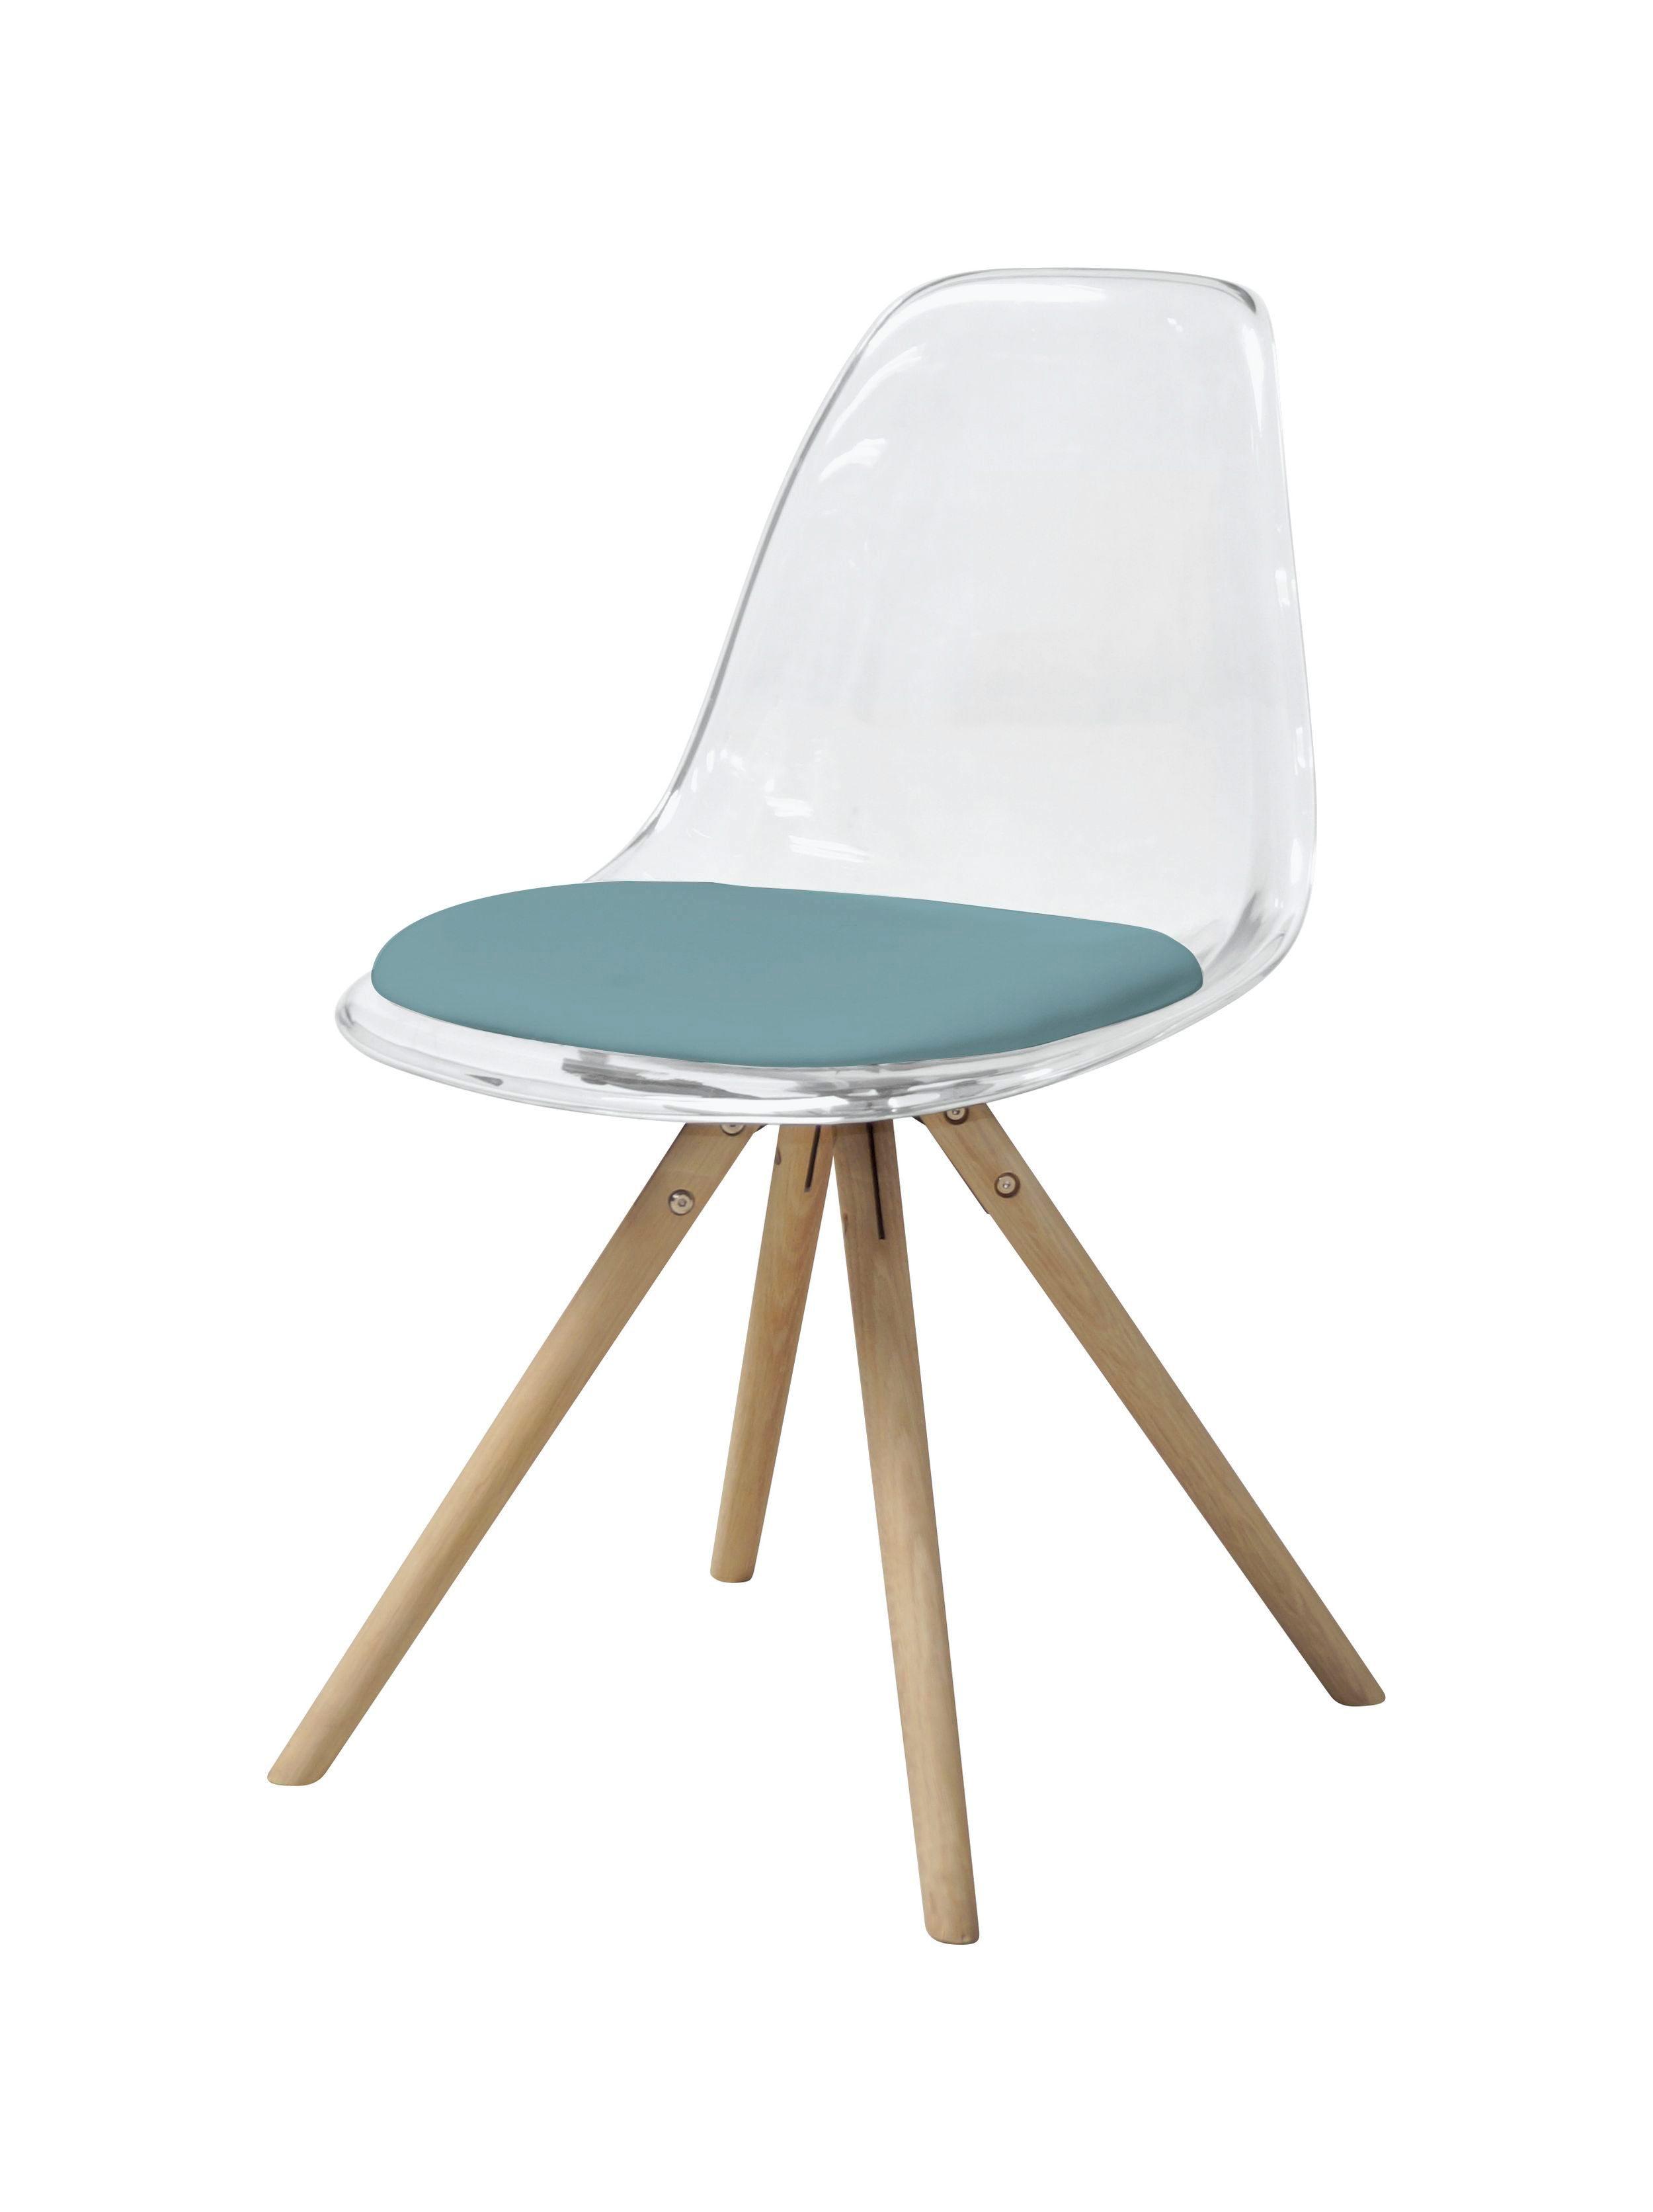 Chaise scandinave lynette